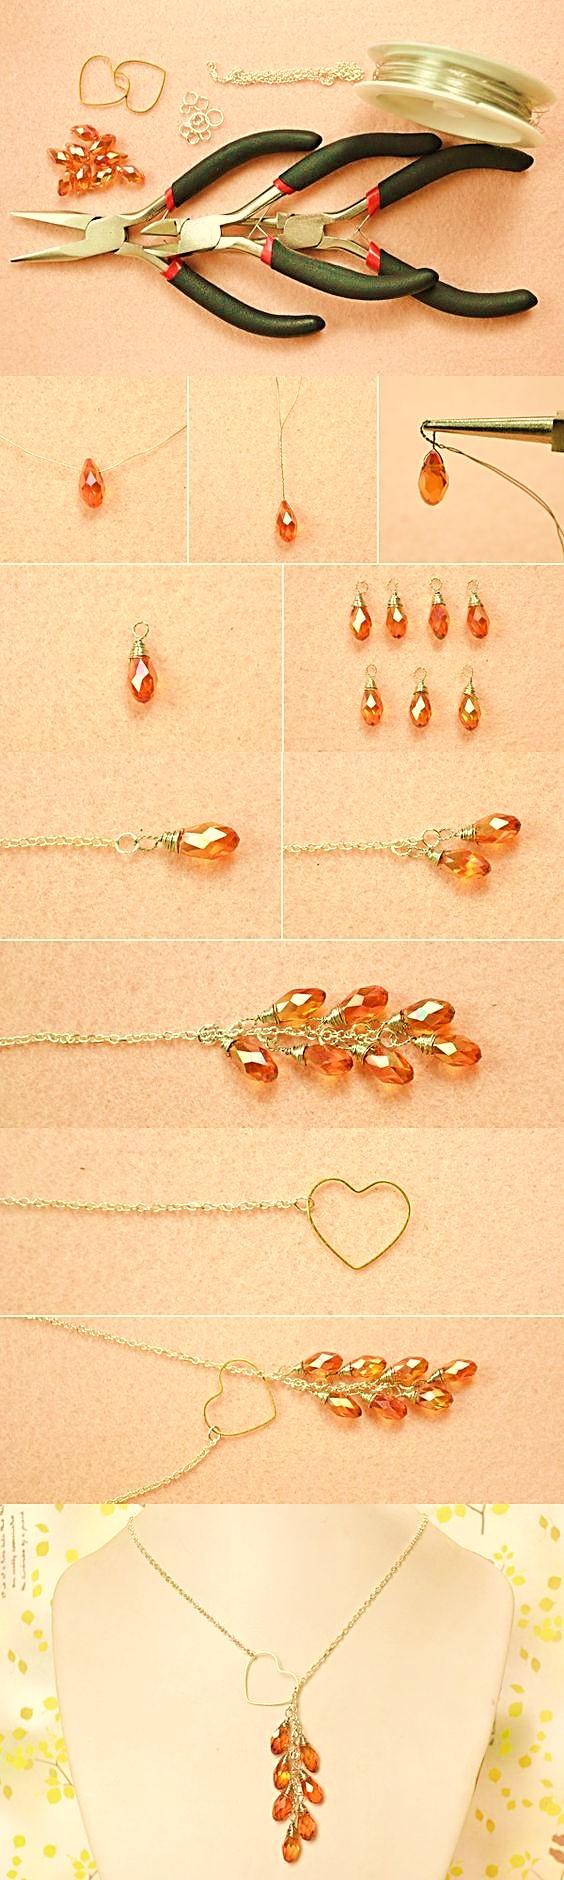 collar cristales ambar bisuteria paso a paso gratis joyeria joyas tutorial